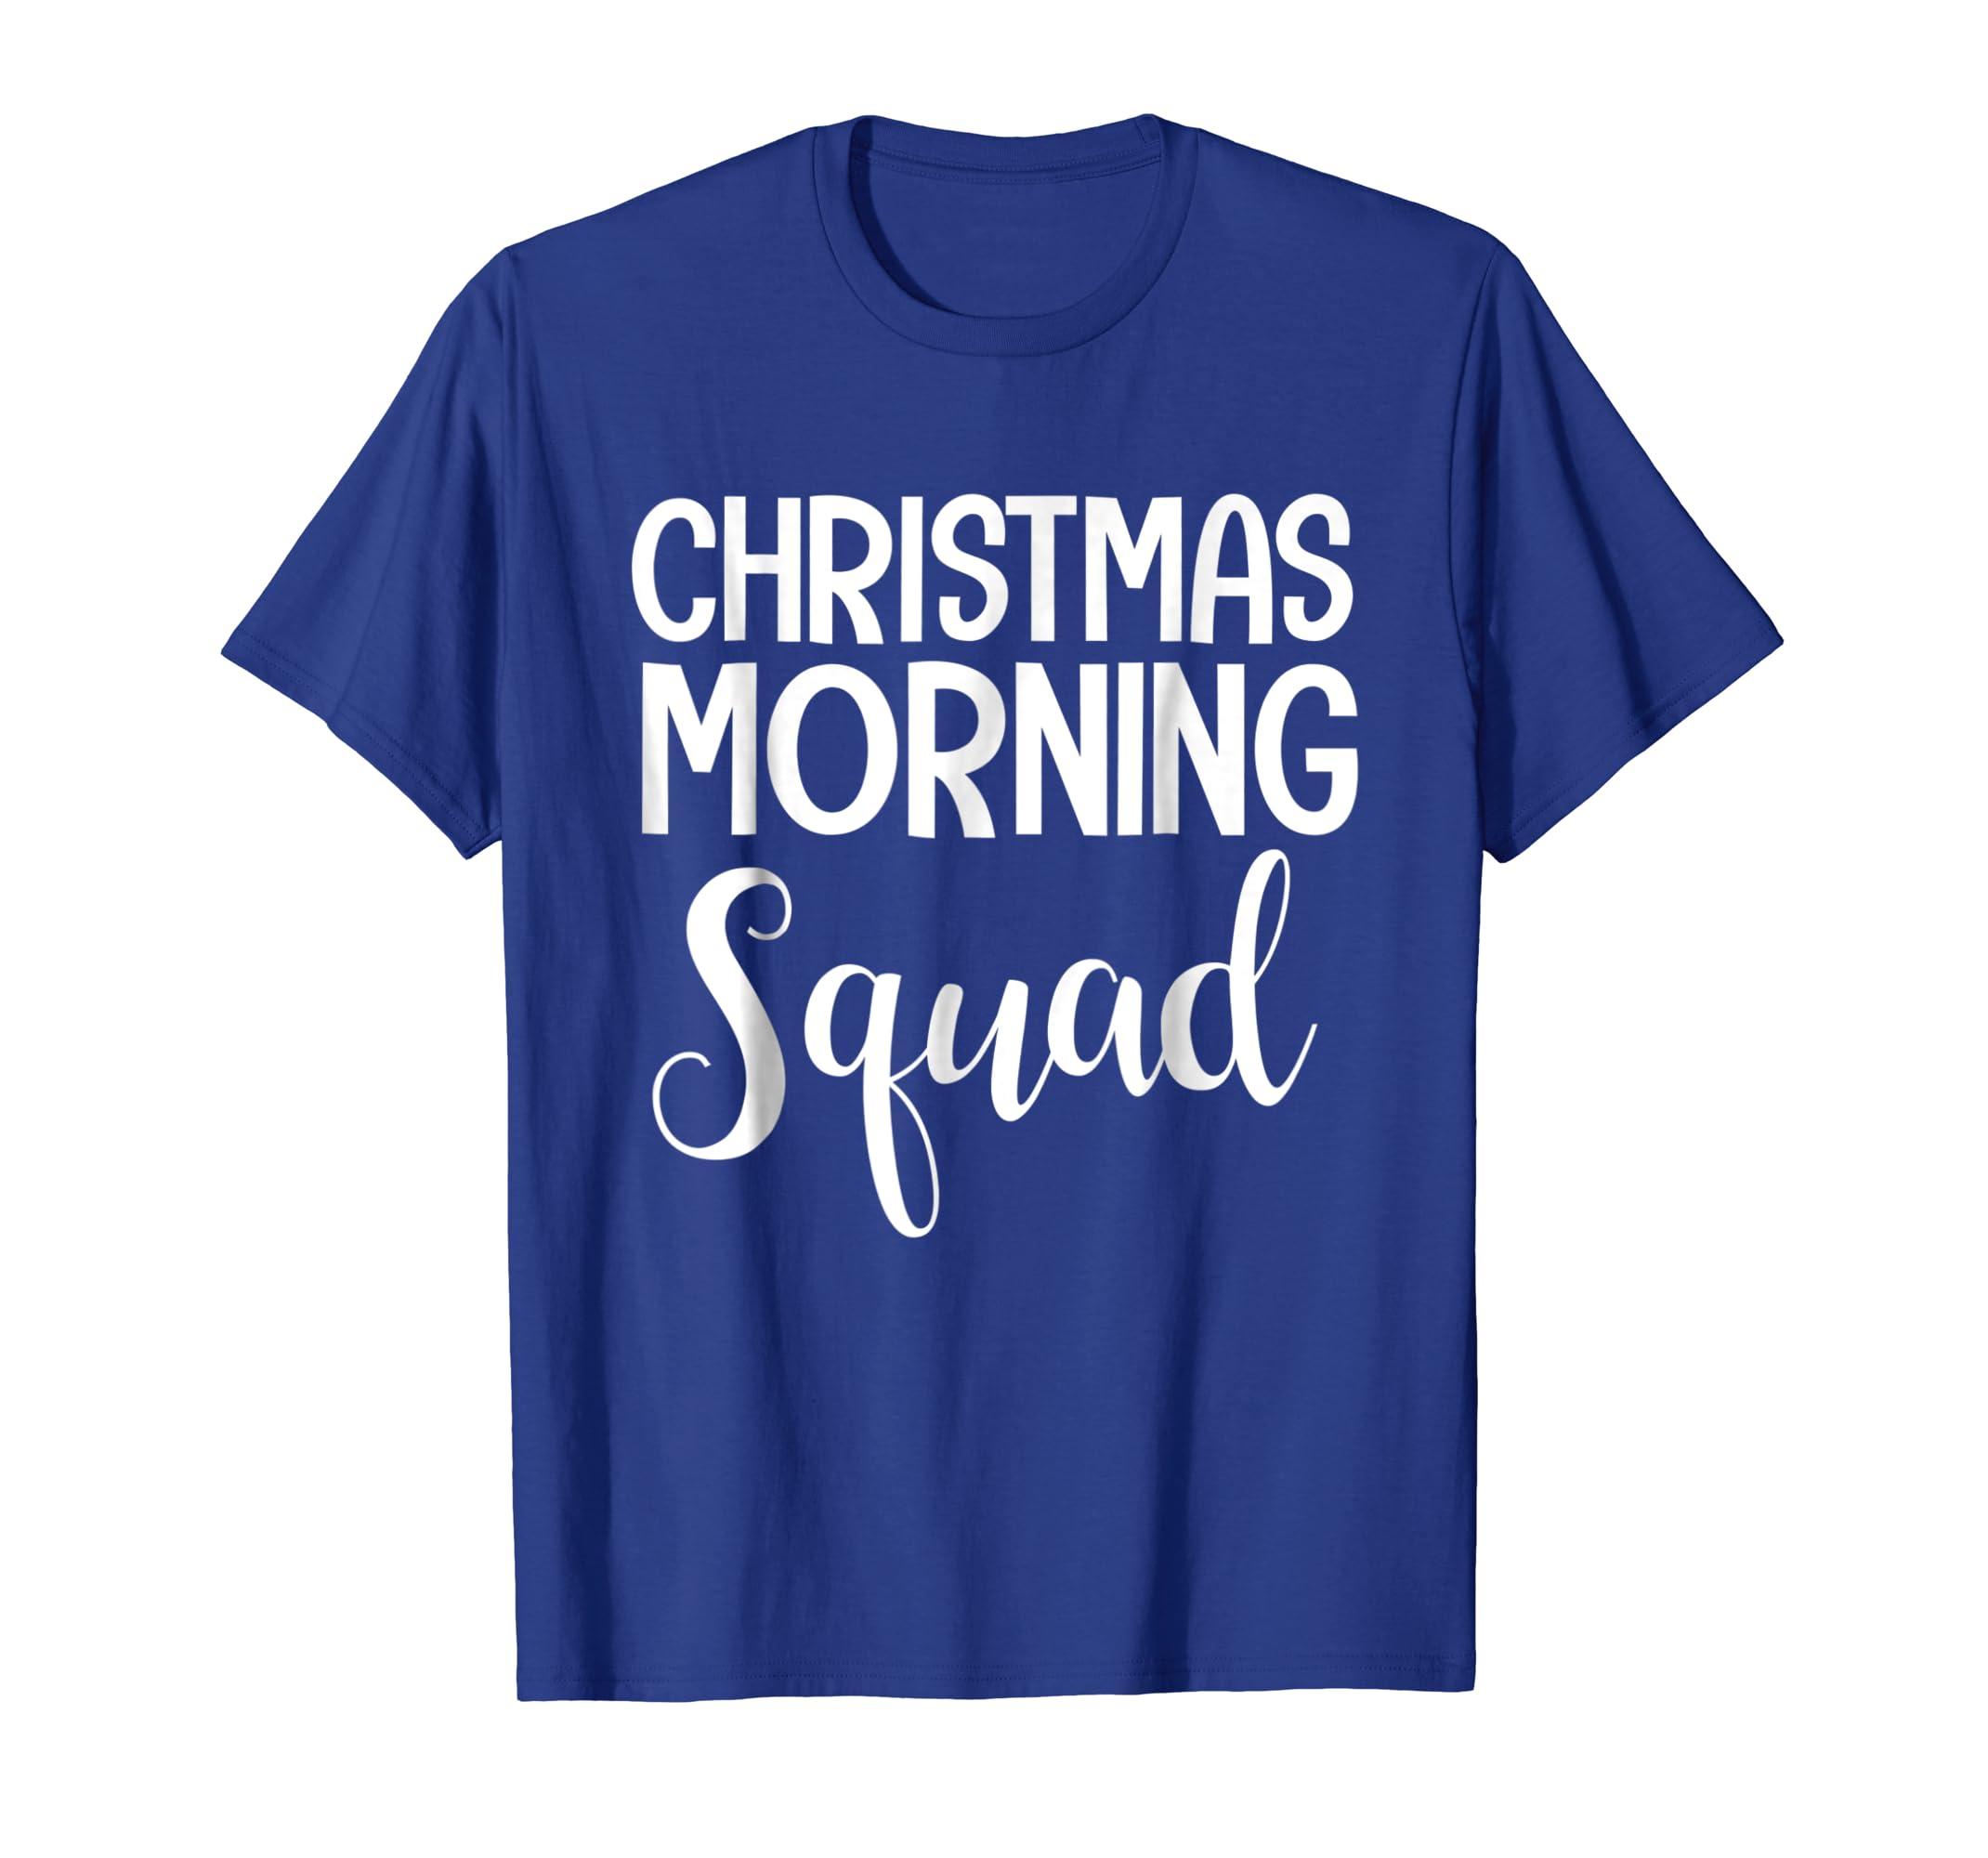 7184ed644d11c Amazon.com: Christmas morning Squad t-shirt funny holiday shirt ...